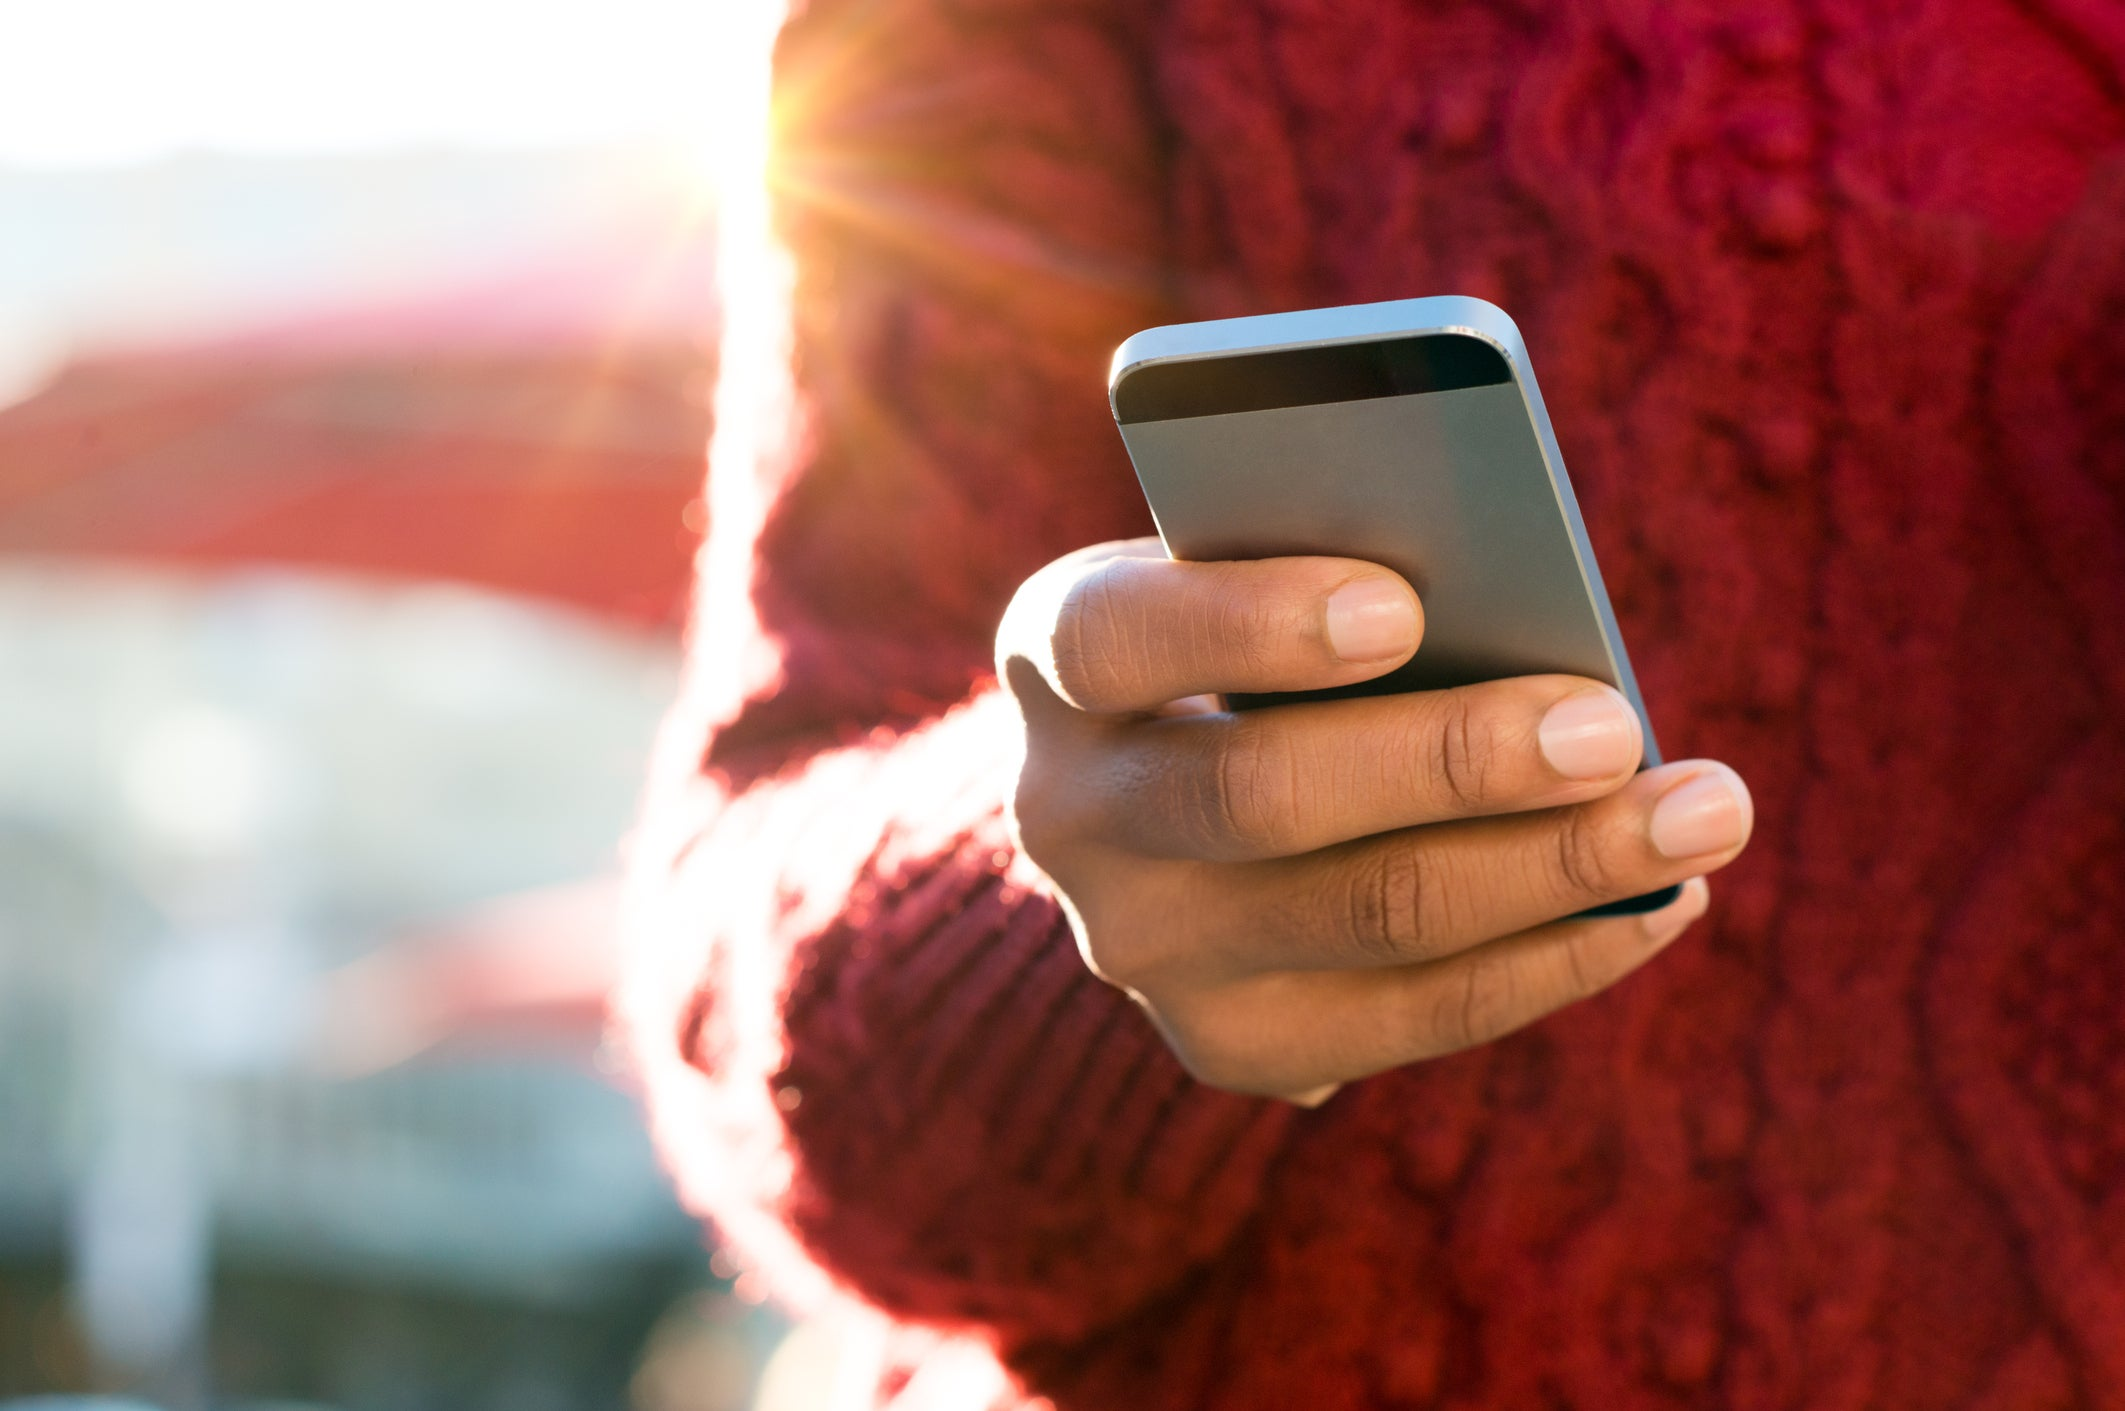 5 Smartphone Myths Kenyans Should Know About